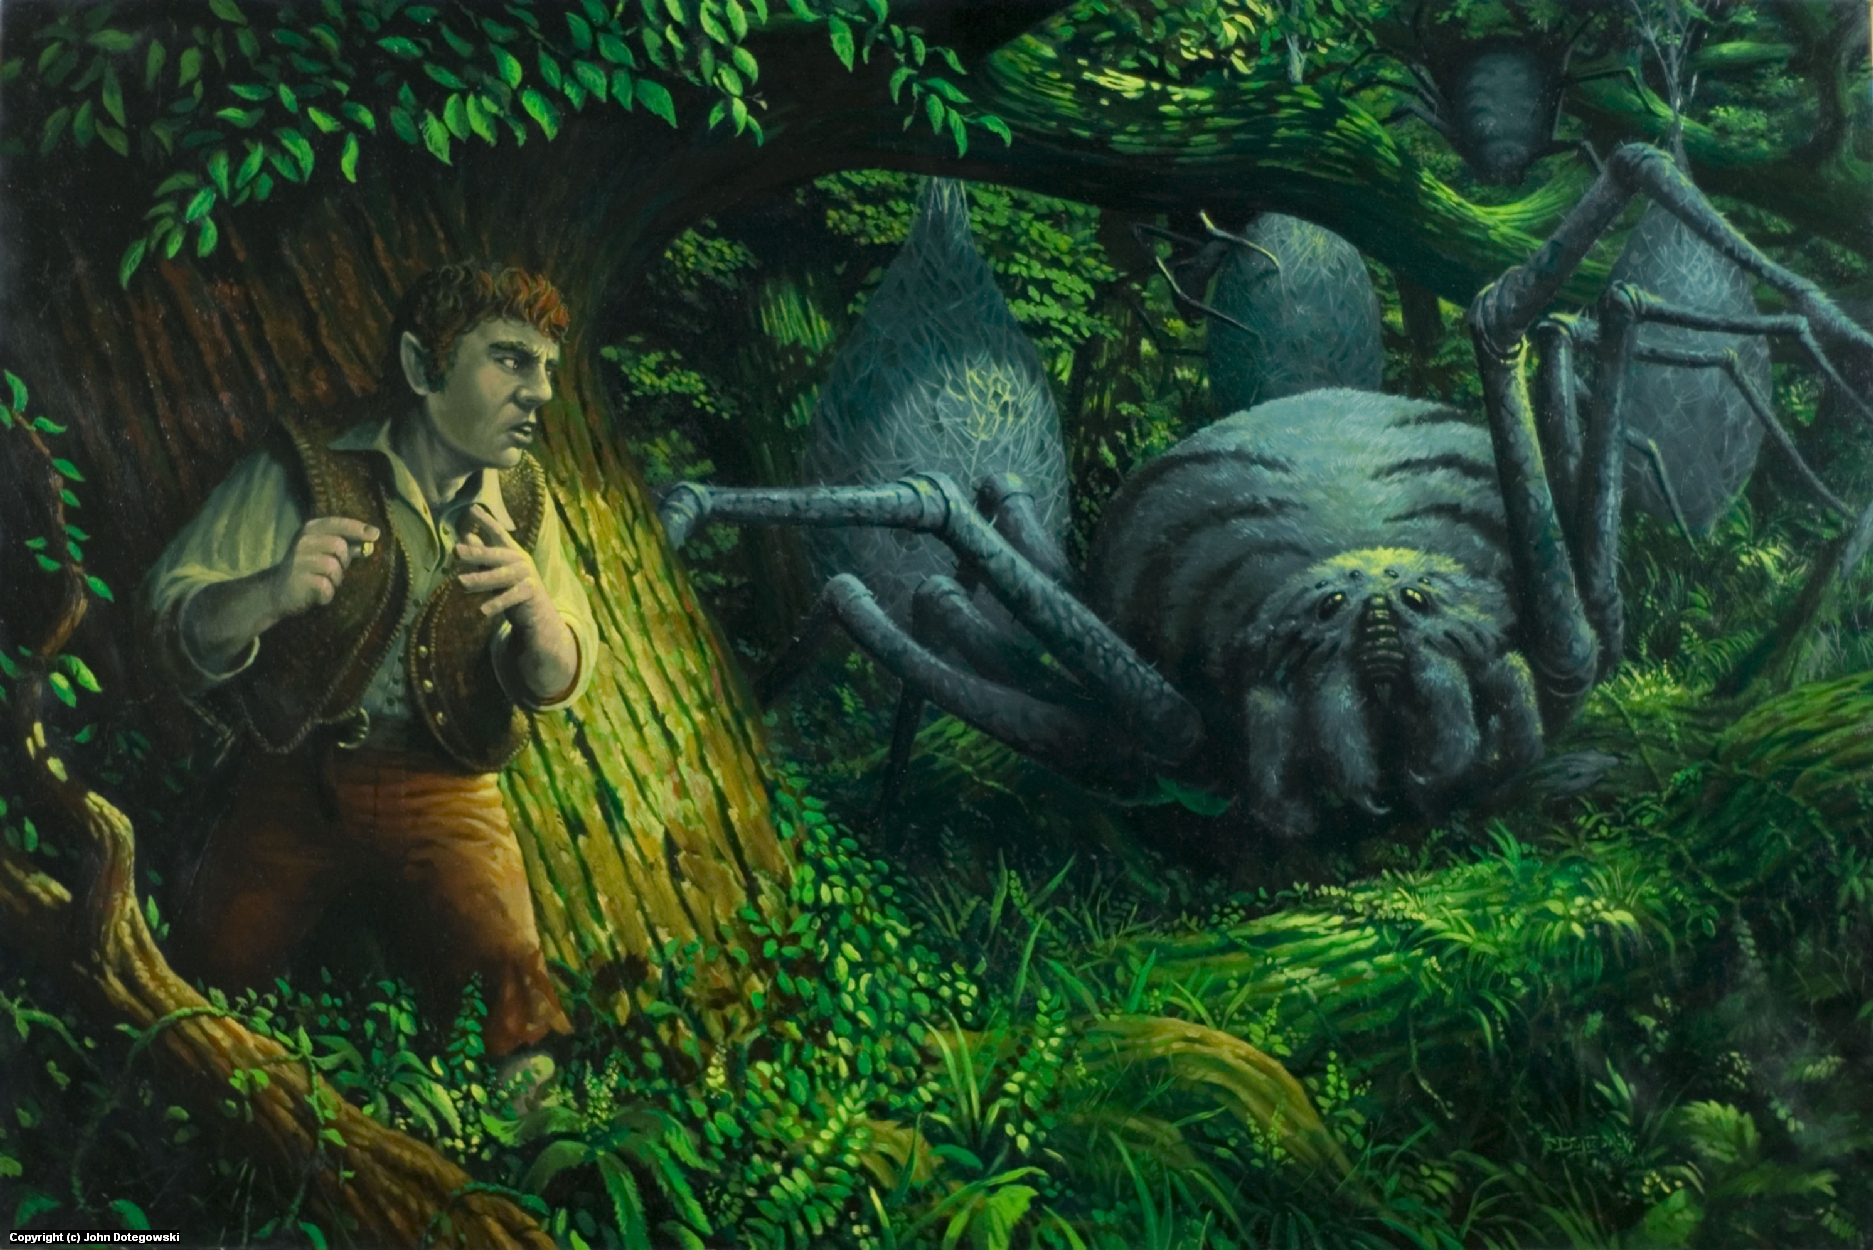 Bilbo in the Mirkwood Artwork by John Dotegowski